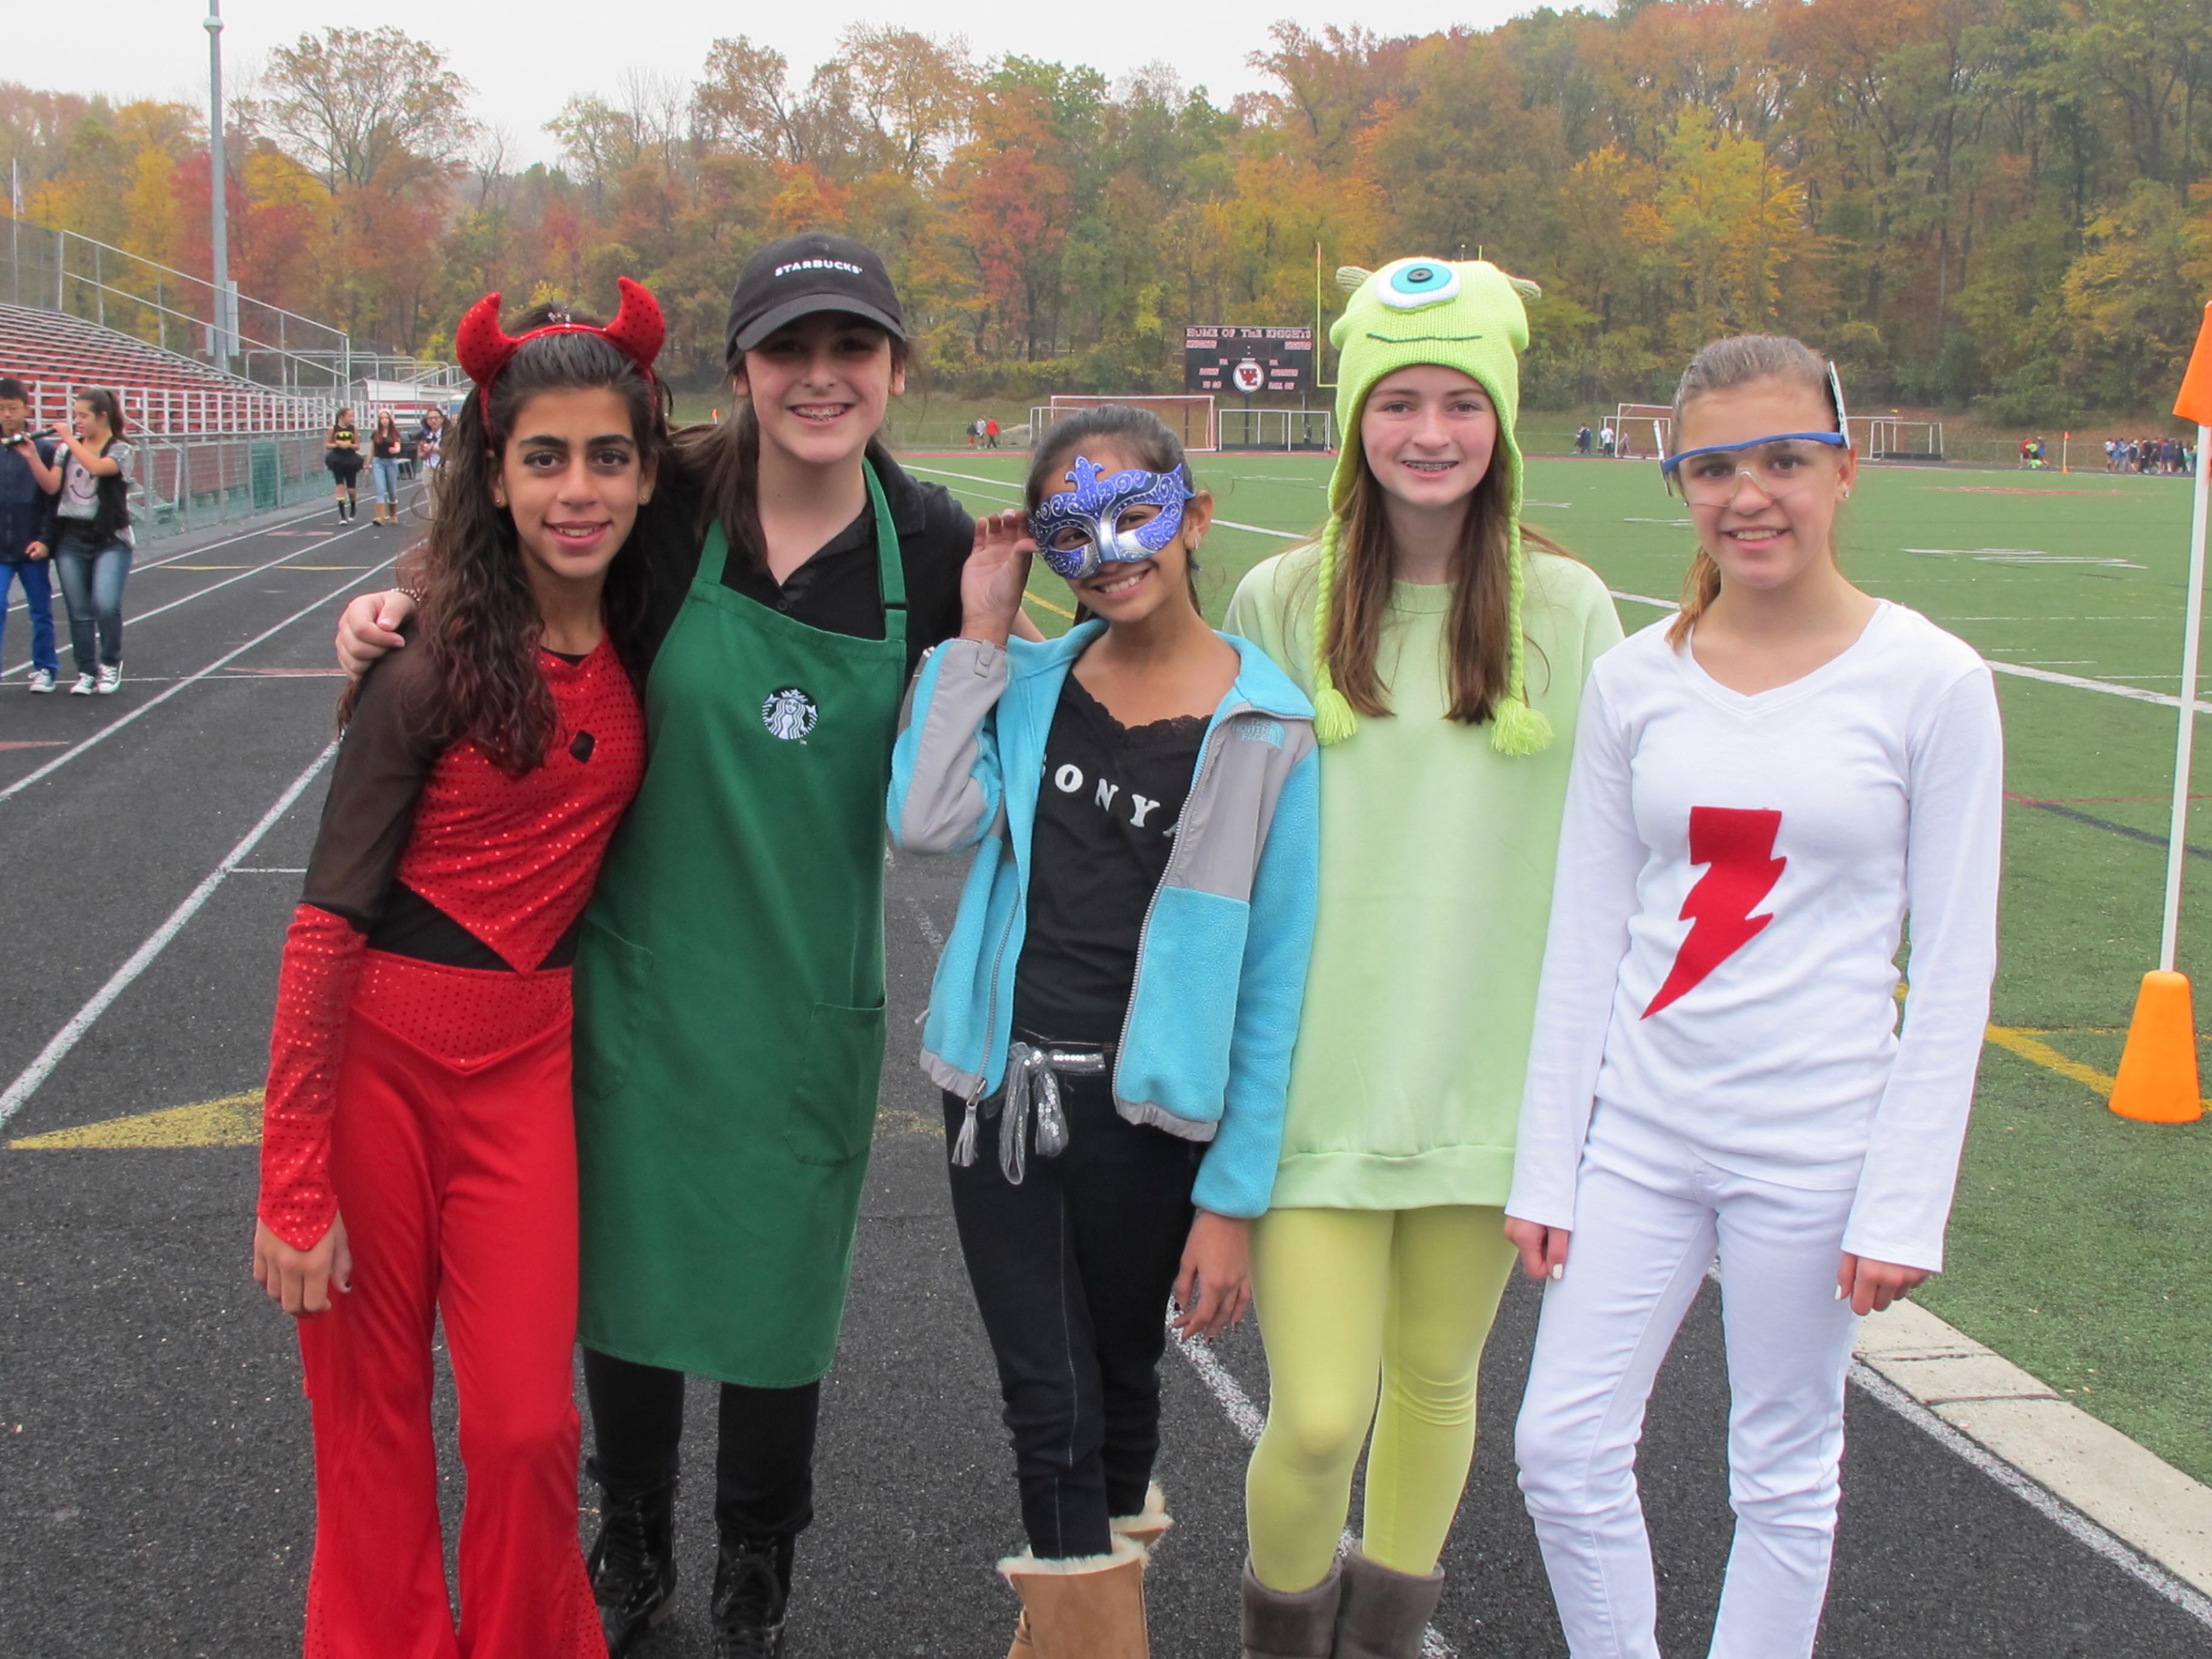 West Esregional Schools Observe Halloween With